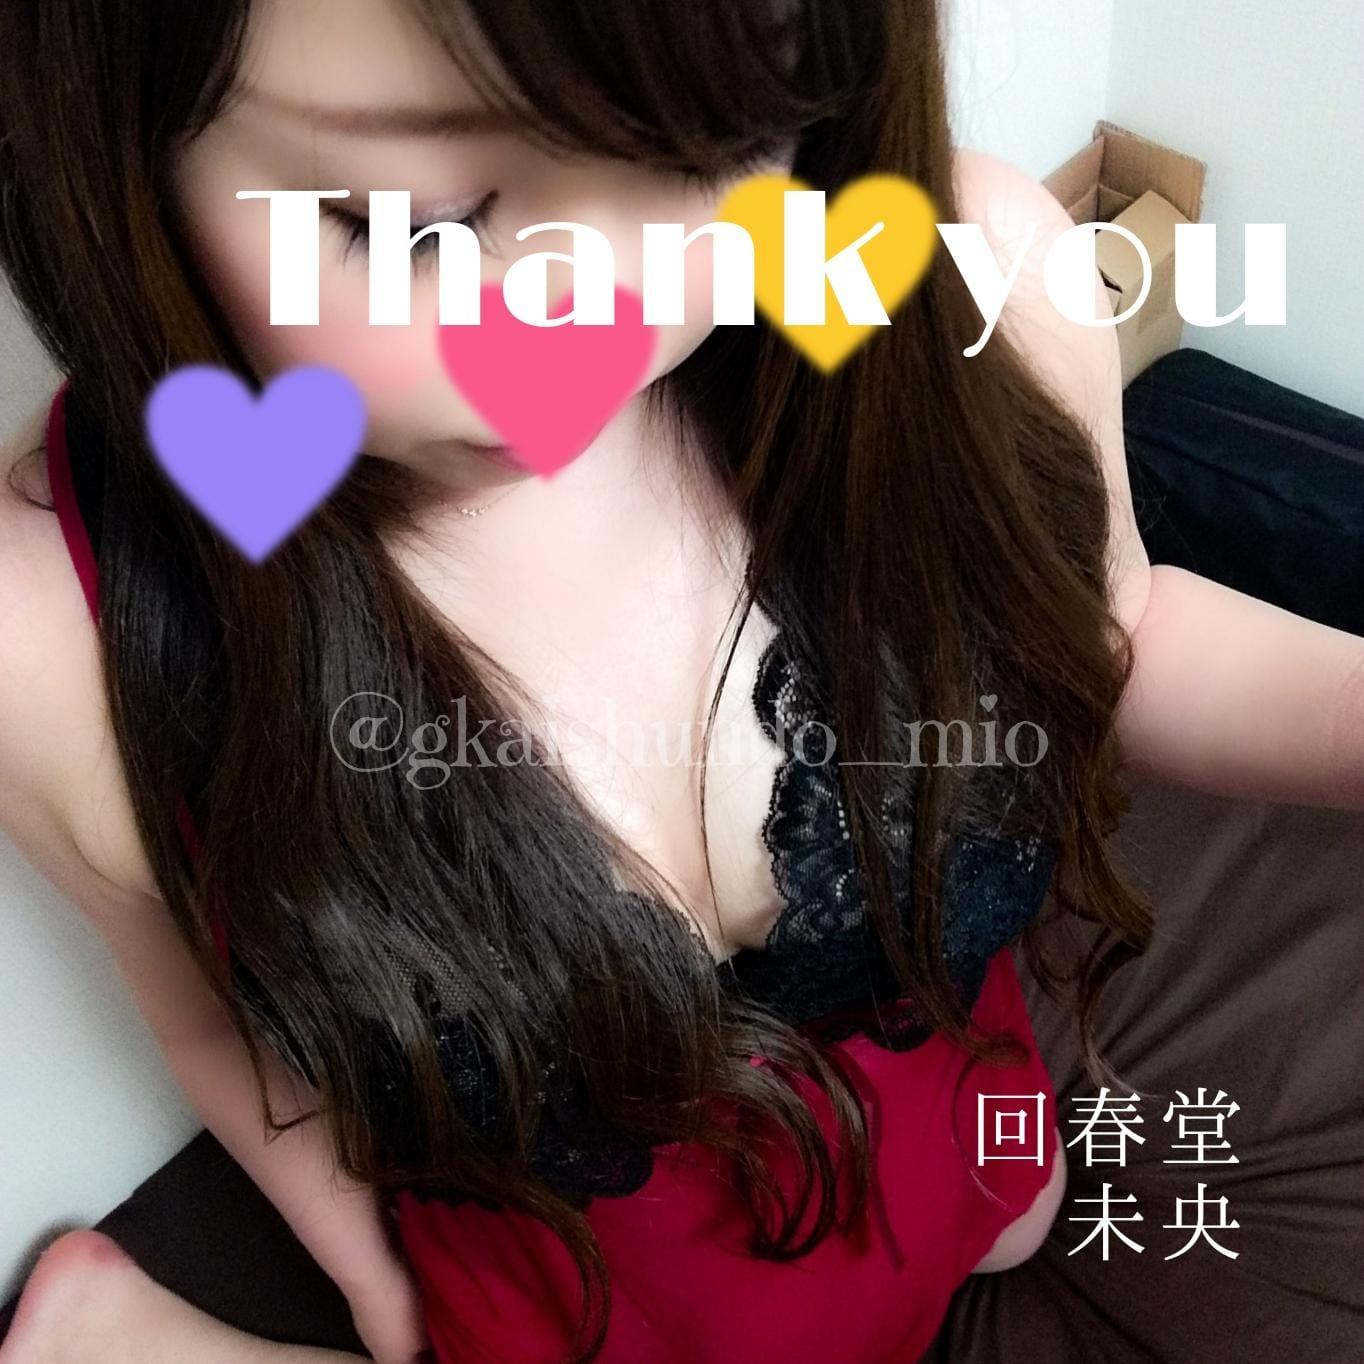 「KさまThank you♪」03/25日(月) 19:20   未央-みお-の写メ・風俗動画